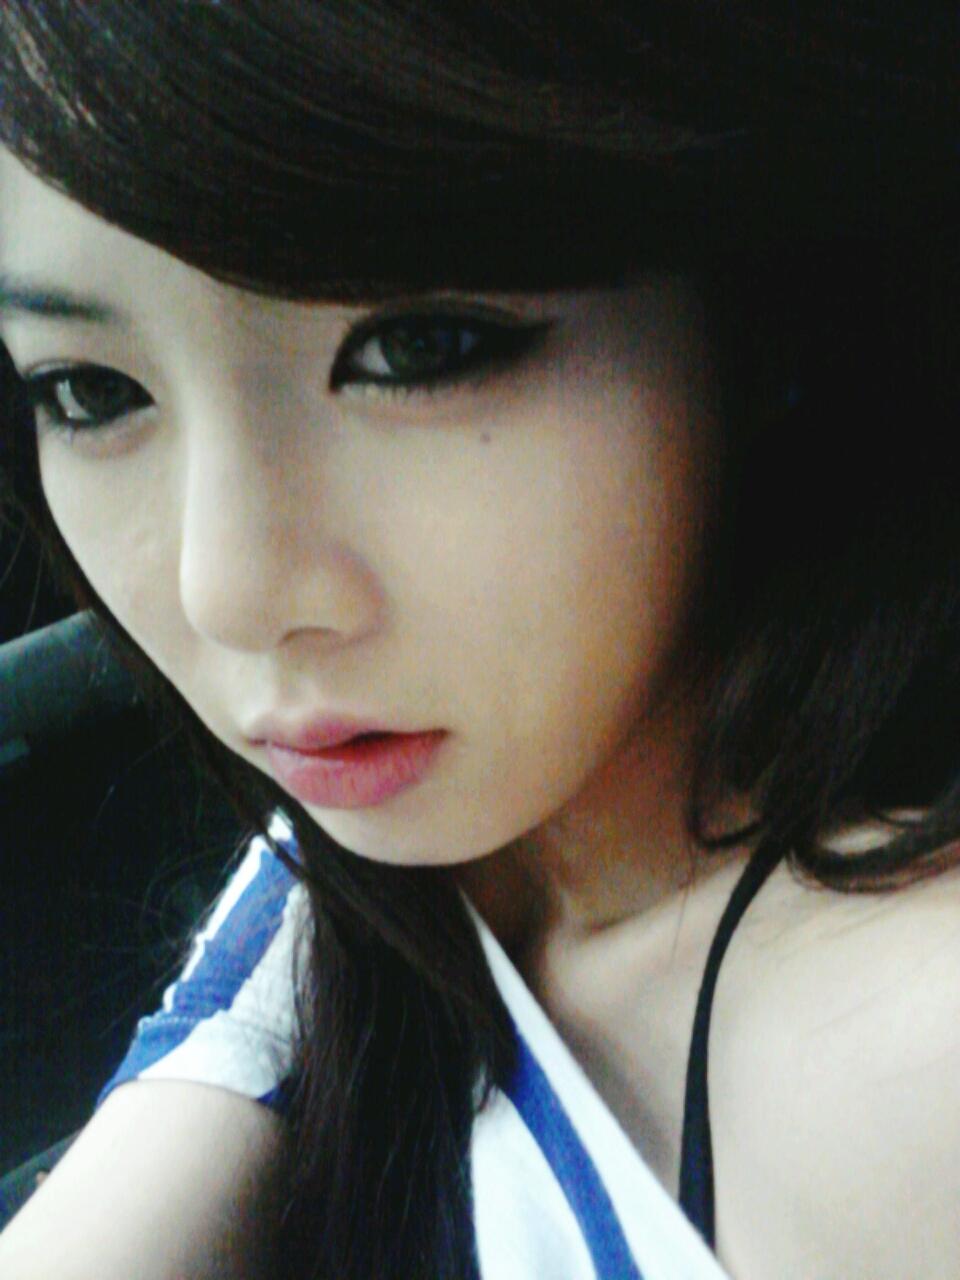 http://2.bp.blogspot.com/-VnaUfIkmcAc/T87TUSlFHgI/AAAAAAAACEA/lEcCIRtd1W4/s1600/Hyuna.jpg